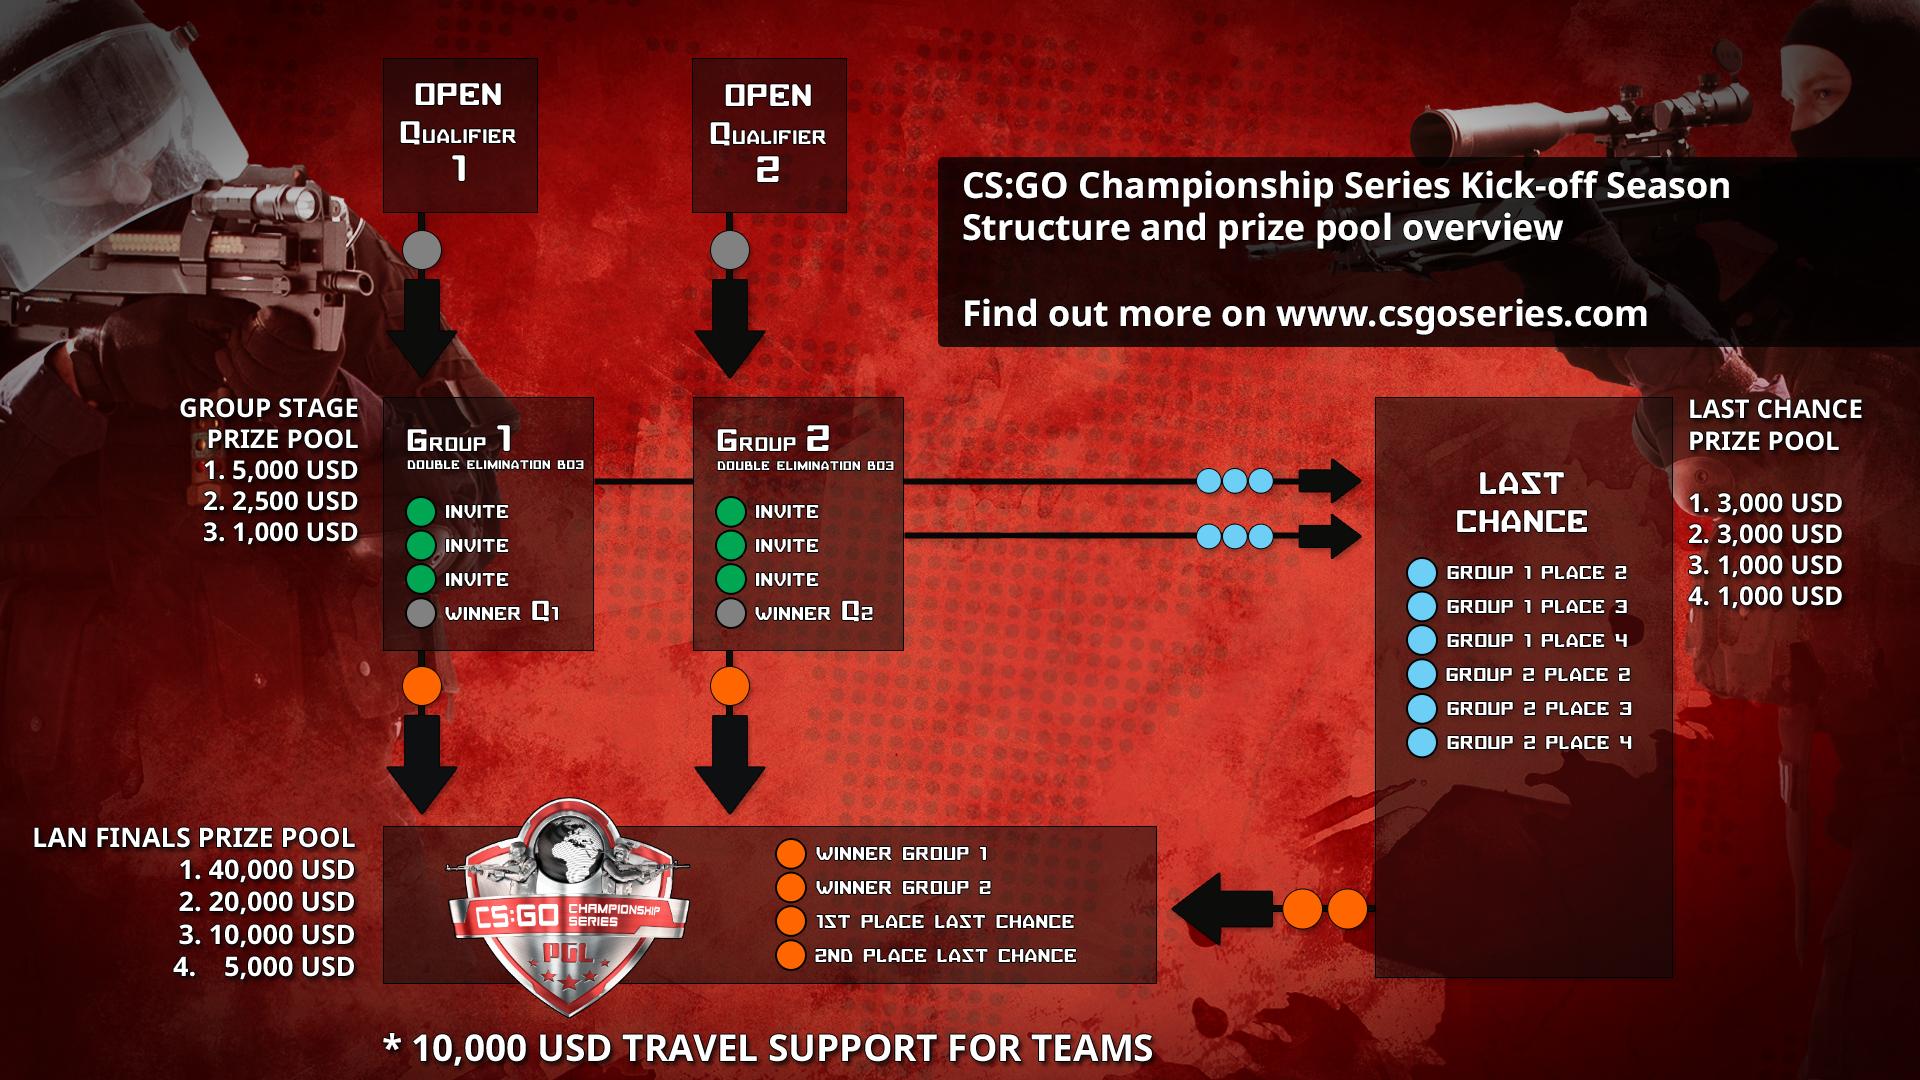 csgo-series-kick-off-season-infographic